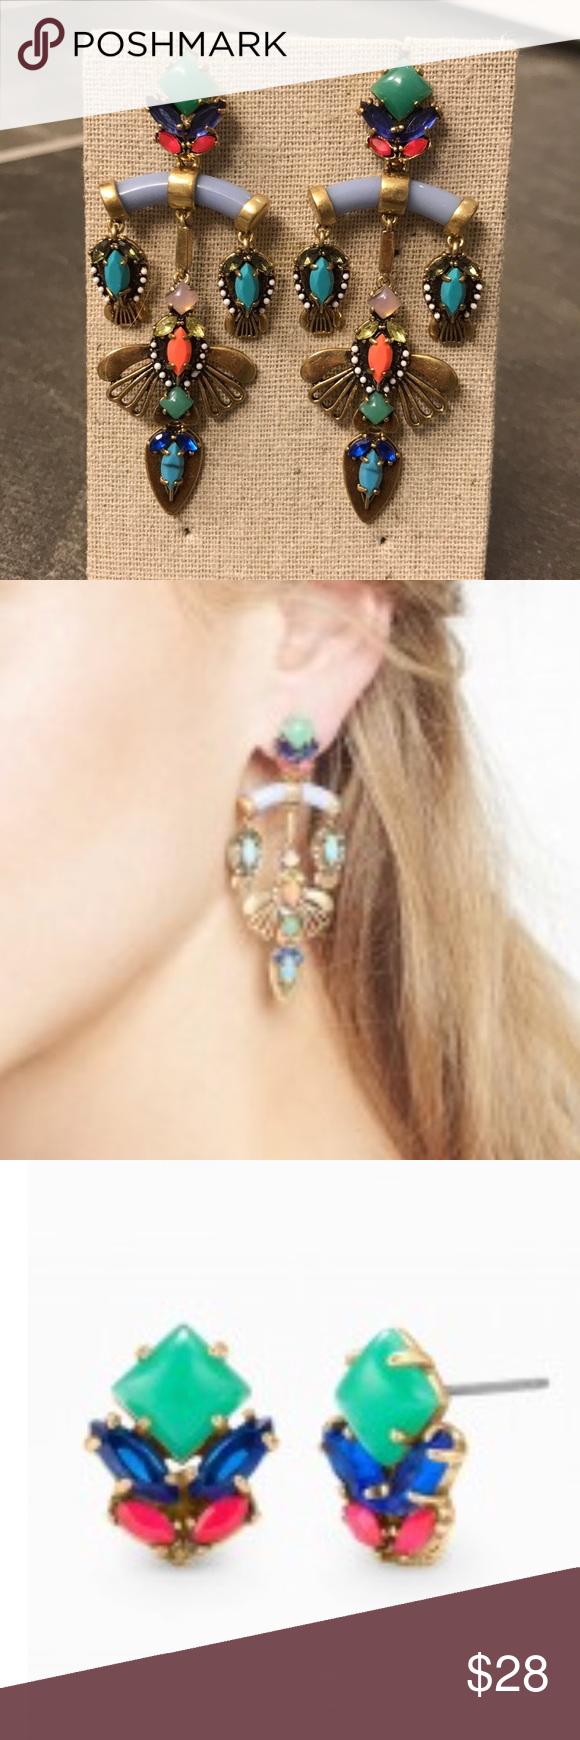 Stella Dot Earrings Cecily Chandelier Can Be Worn As Studs Like New Jewelry